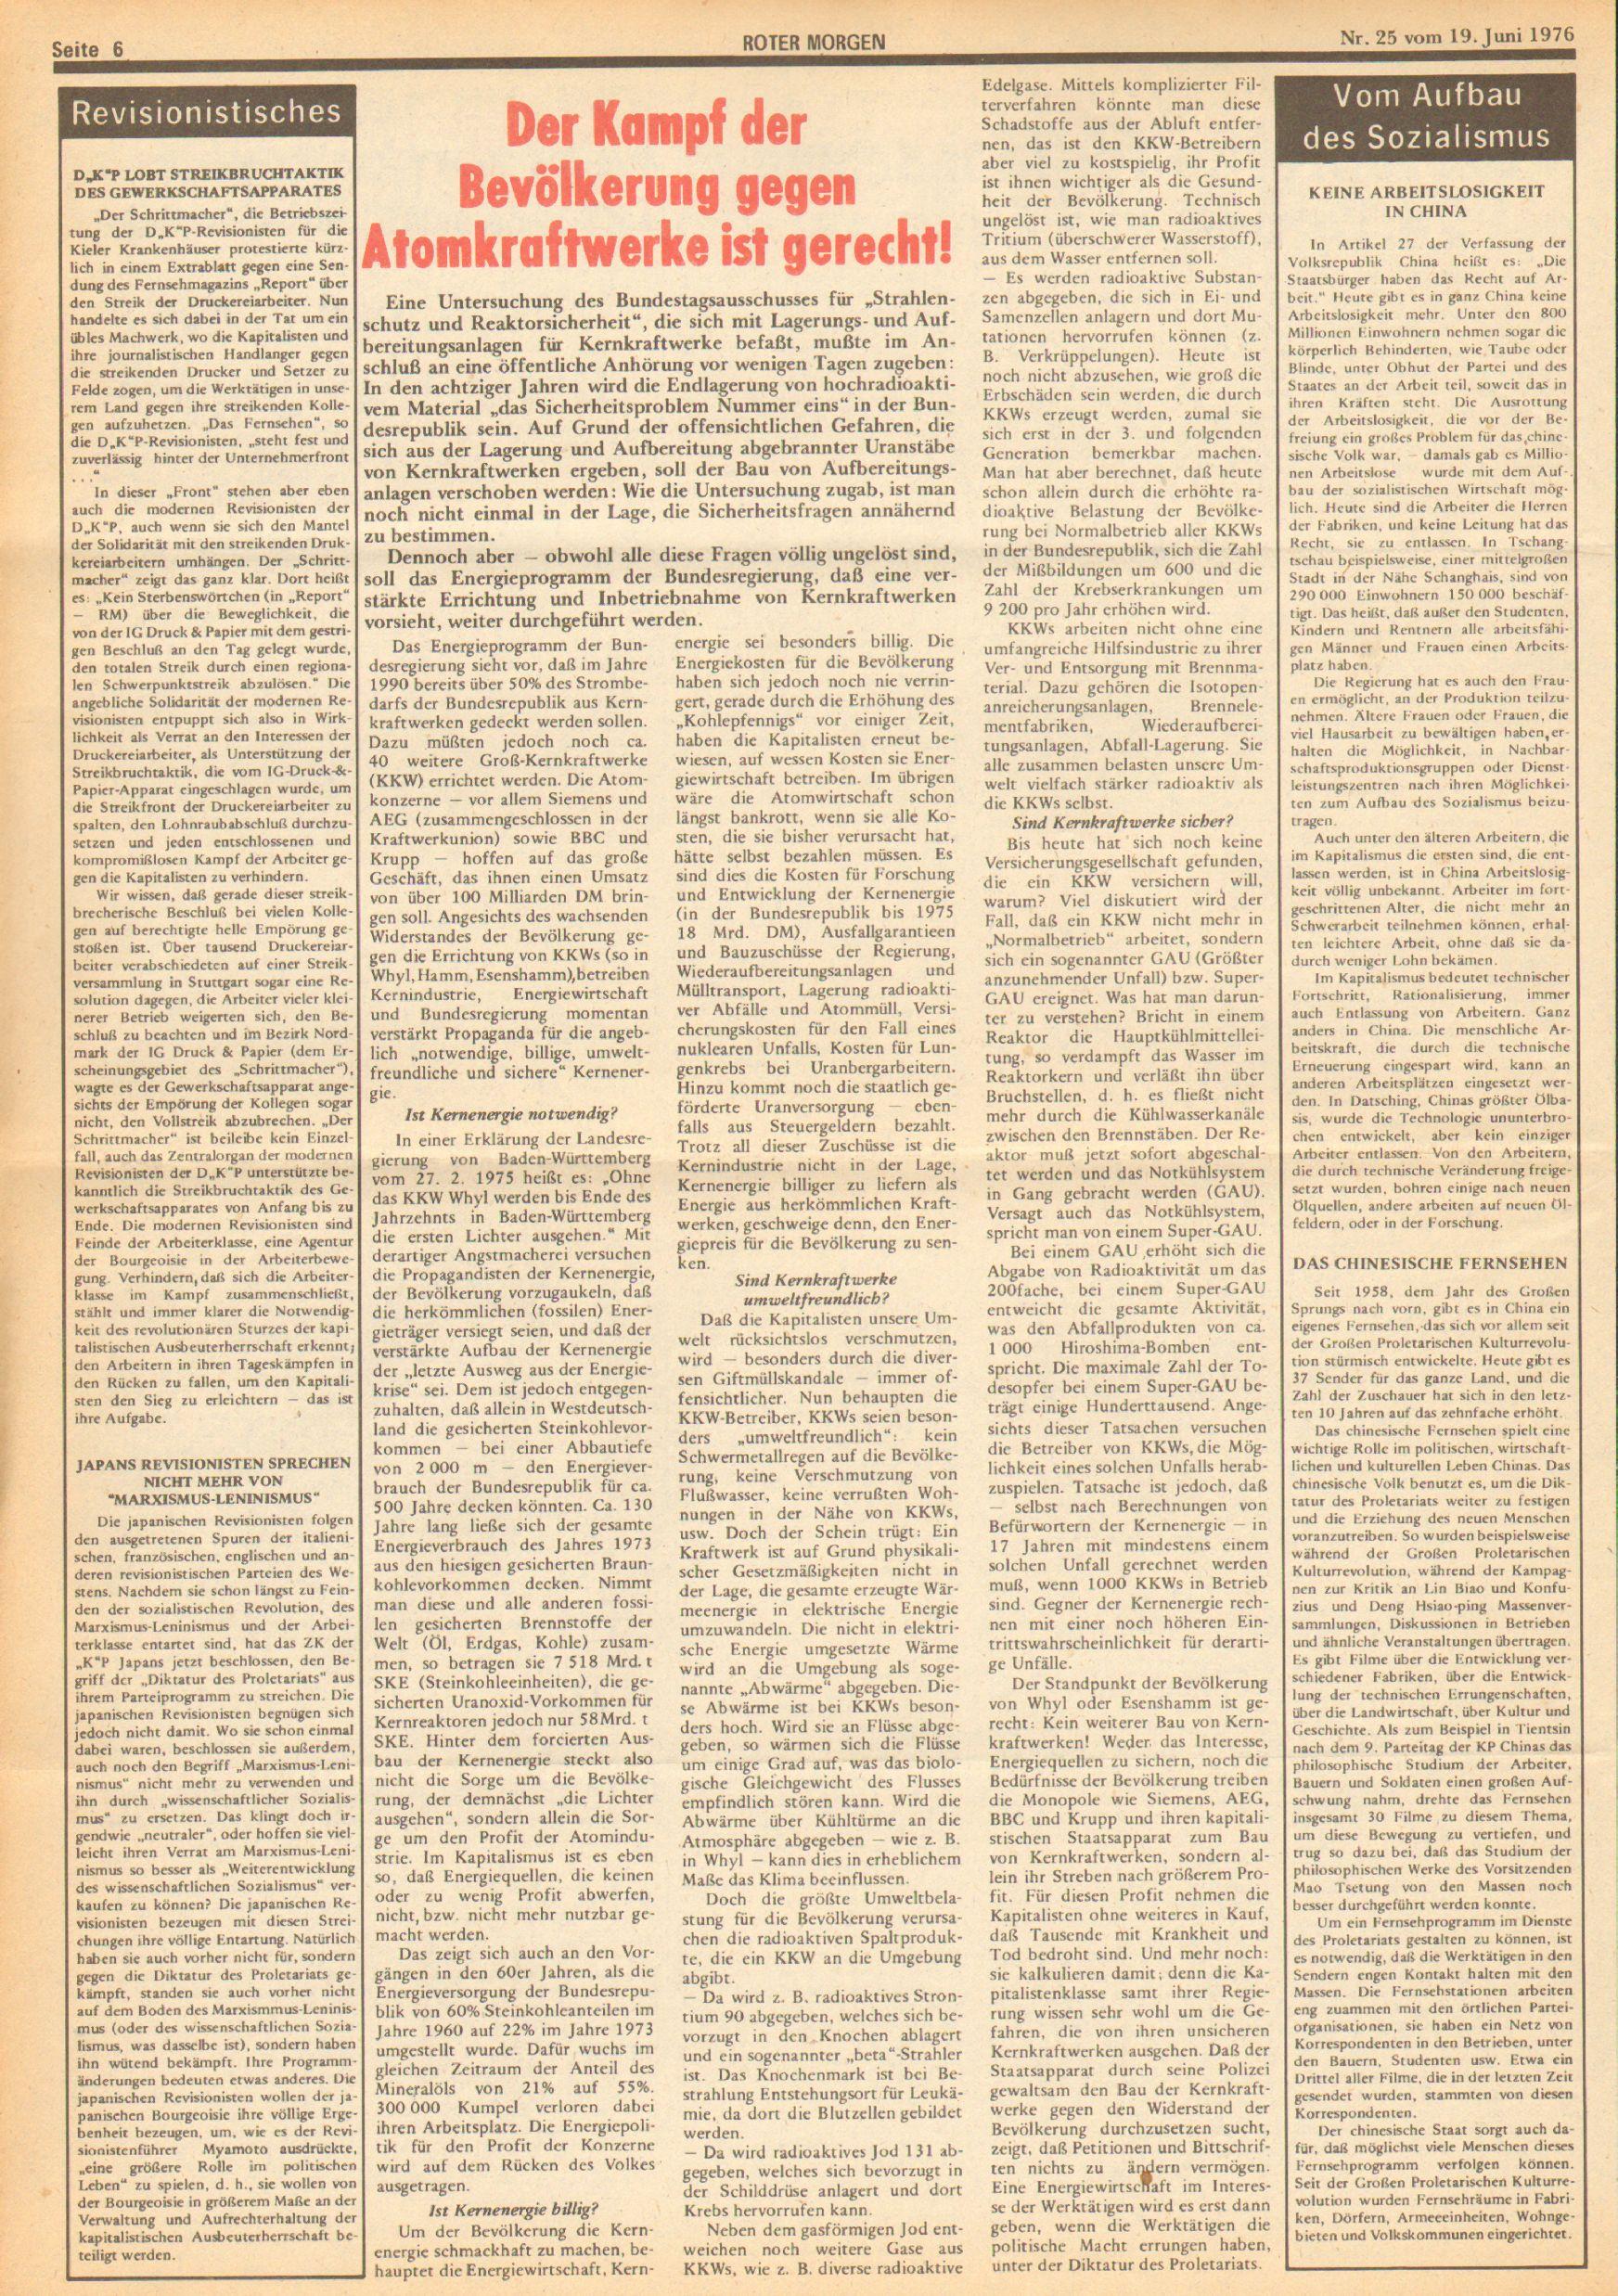 Roter Morgen, 10. Jg., 19. Juni 1976, Nr. 25, Seite 6